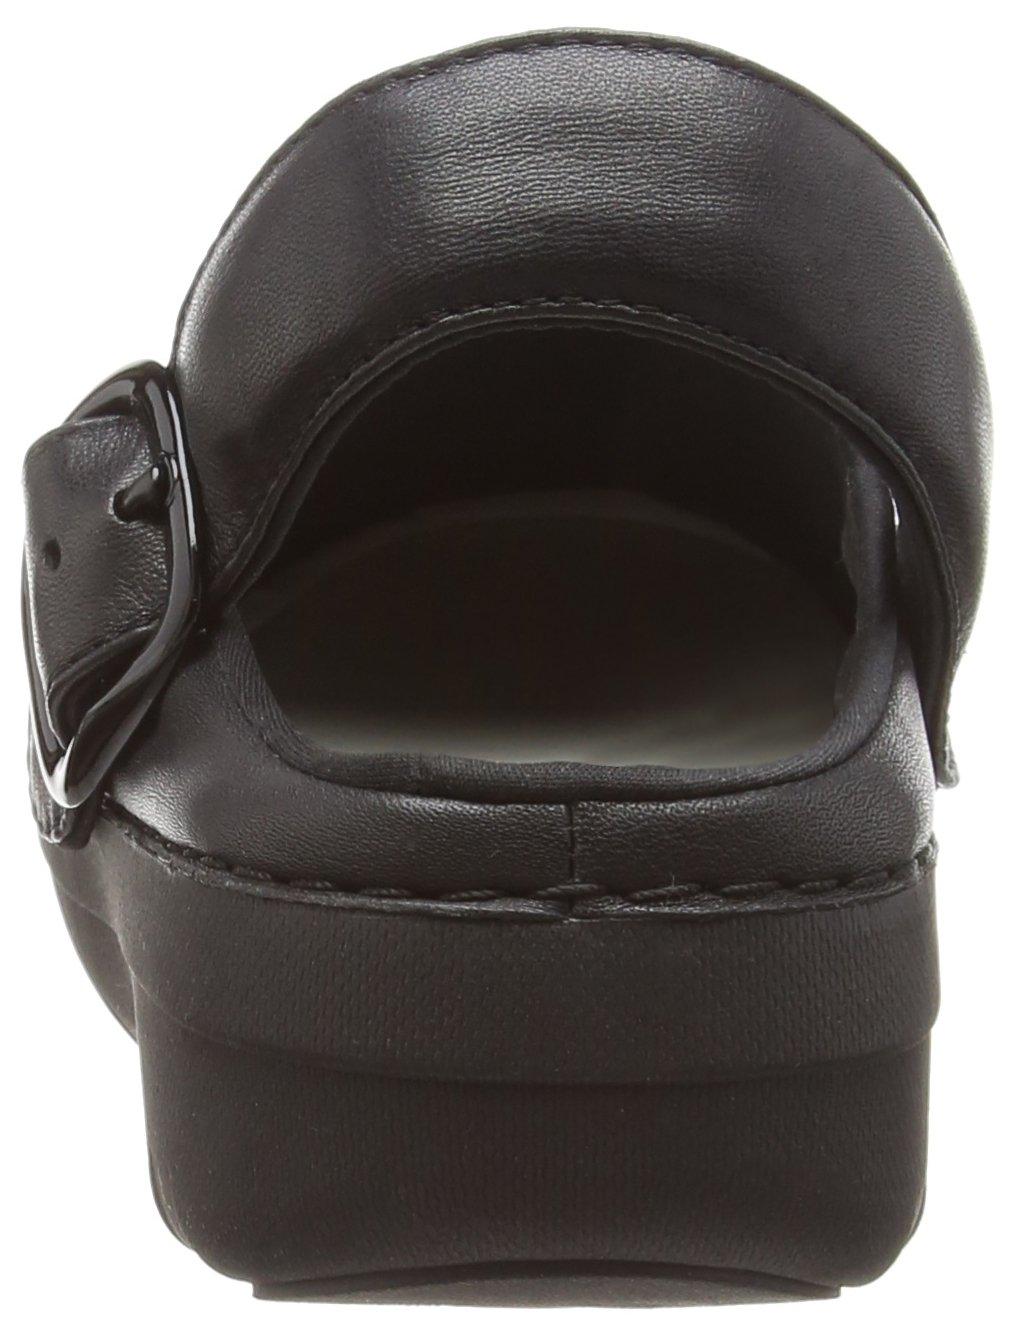 FitFlop Women's Gogh Pro Superlight Medical Professional Shoe B00SLOPCAK 5 B(M) US|Black